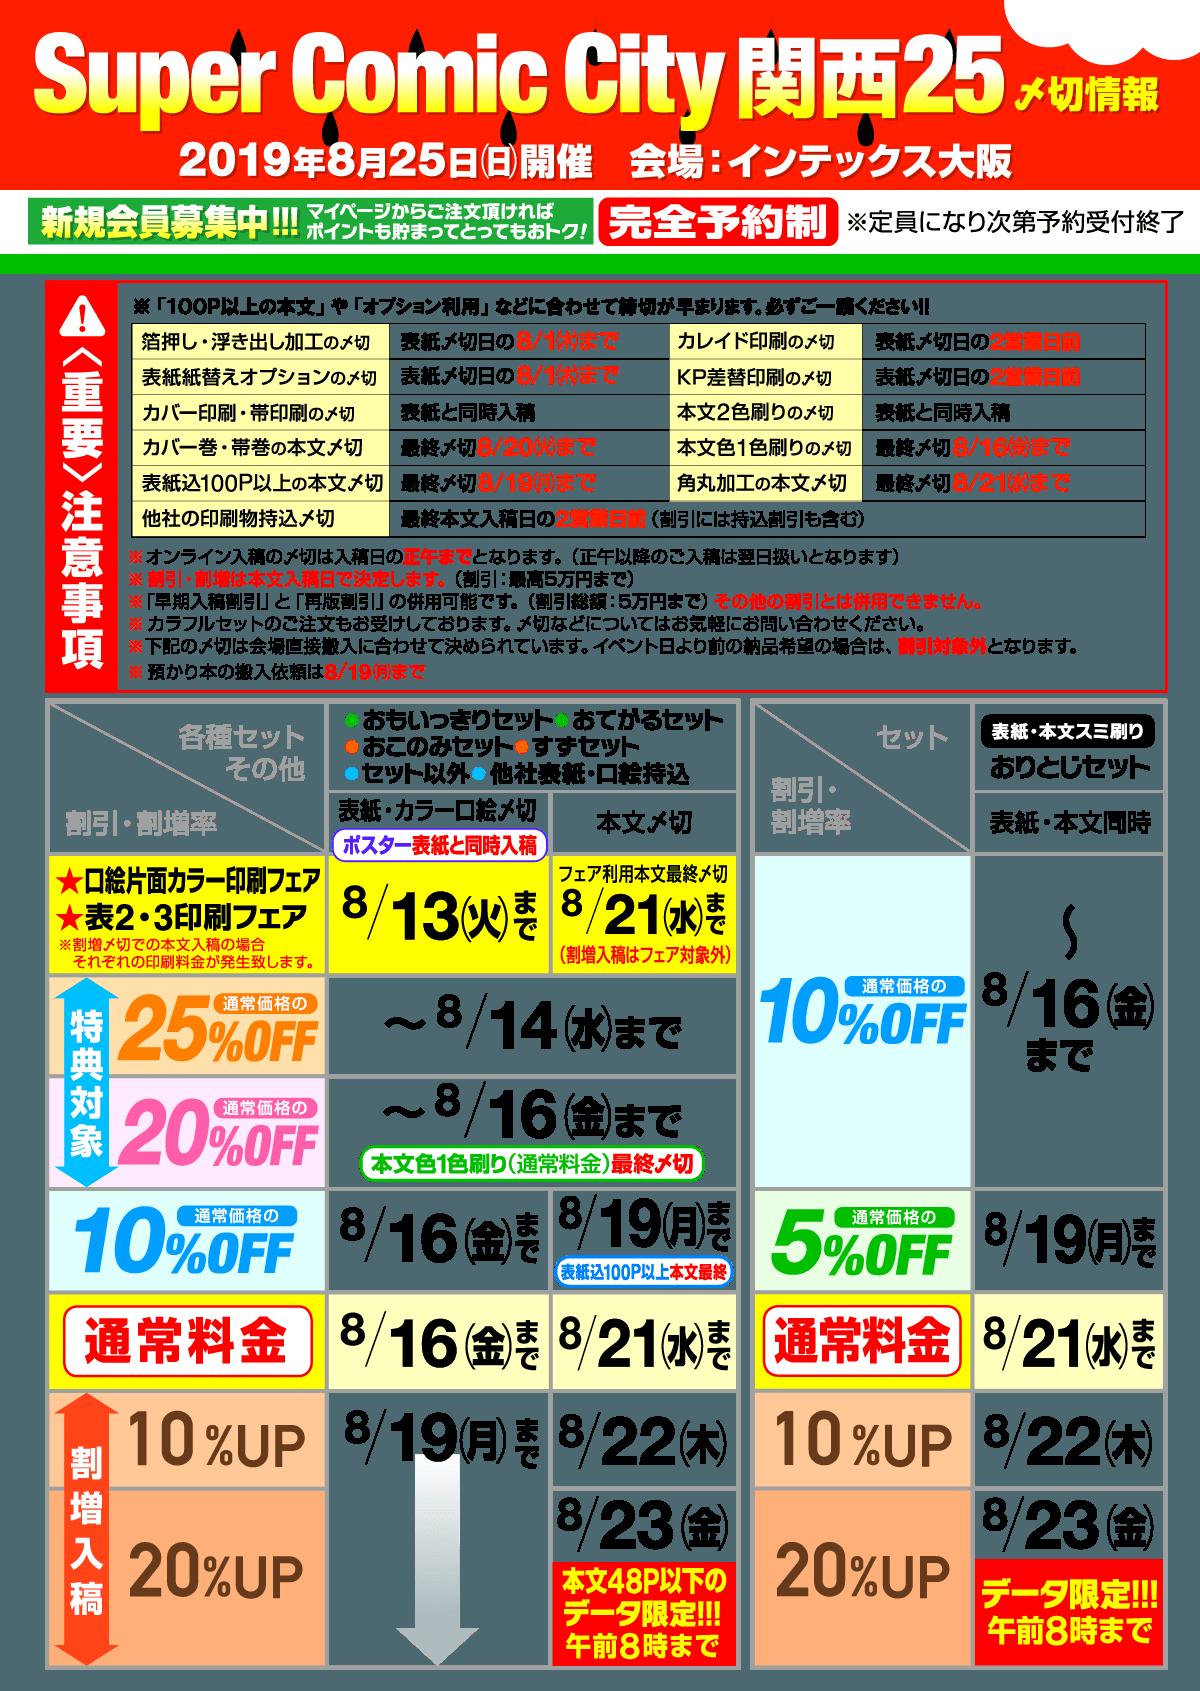 2019 SUPER COMIC CITY 関西25 〆切情報